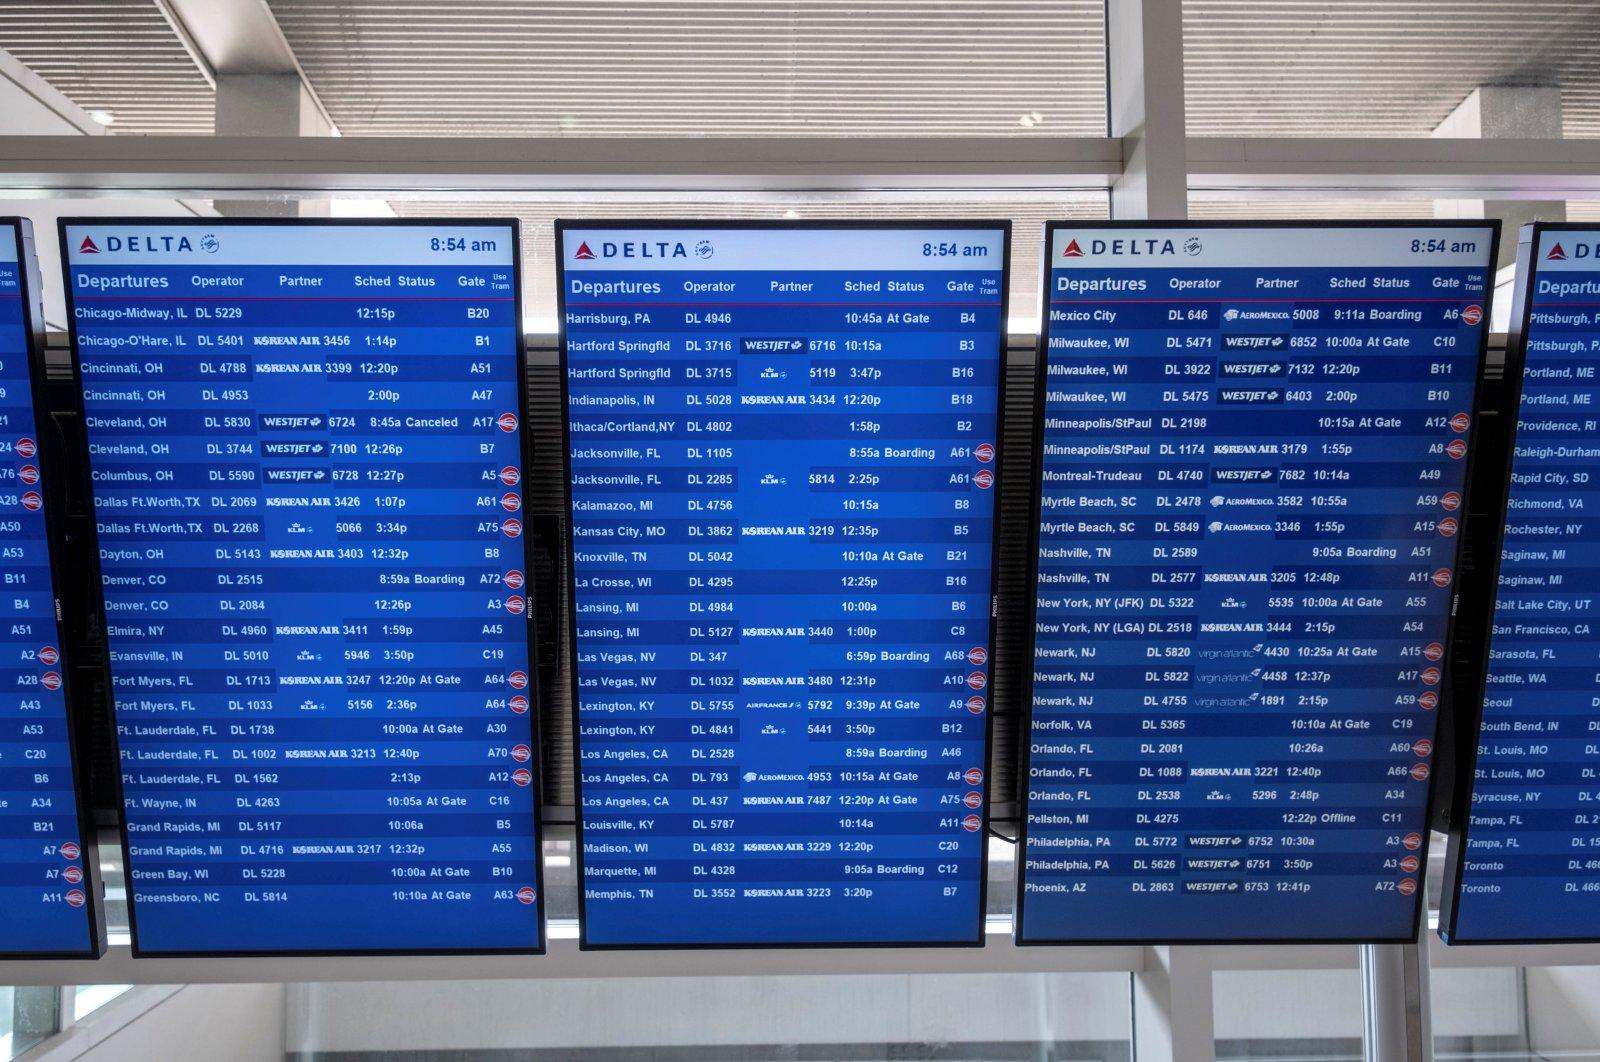 Flight information display screens are seen at the Detroit Metropolitan Wayne County Airport in Detroit, Michigan, U.S. June 12, 2021. (Reuters Photo)